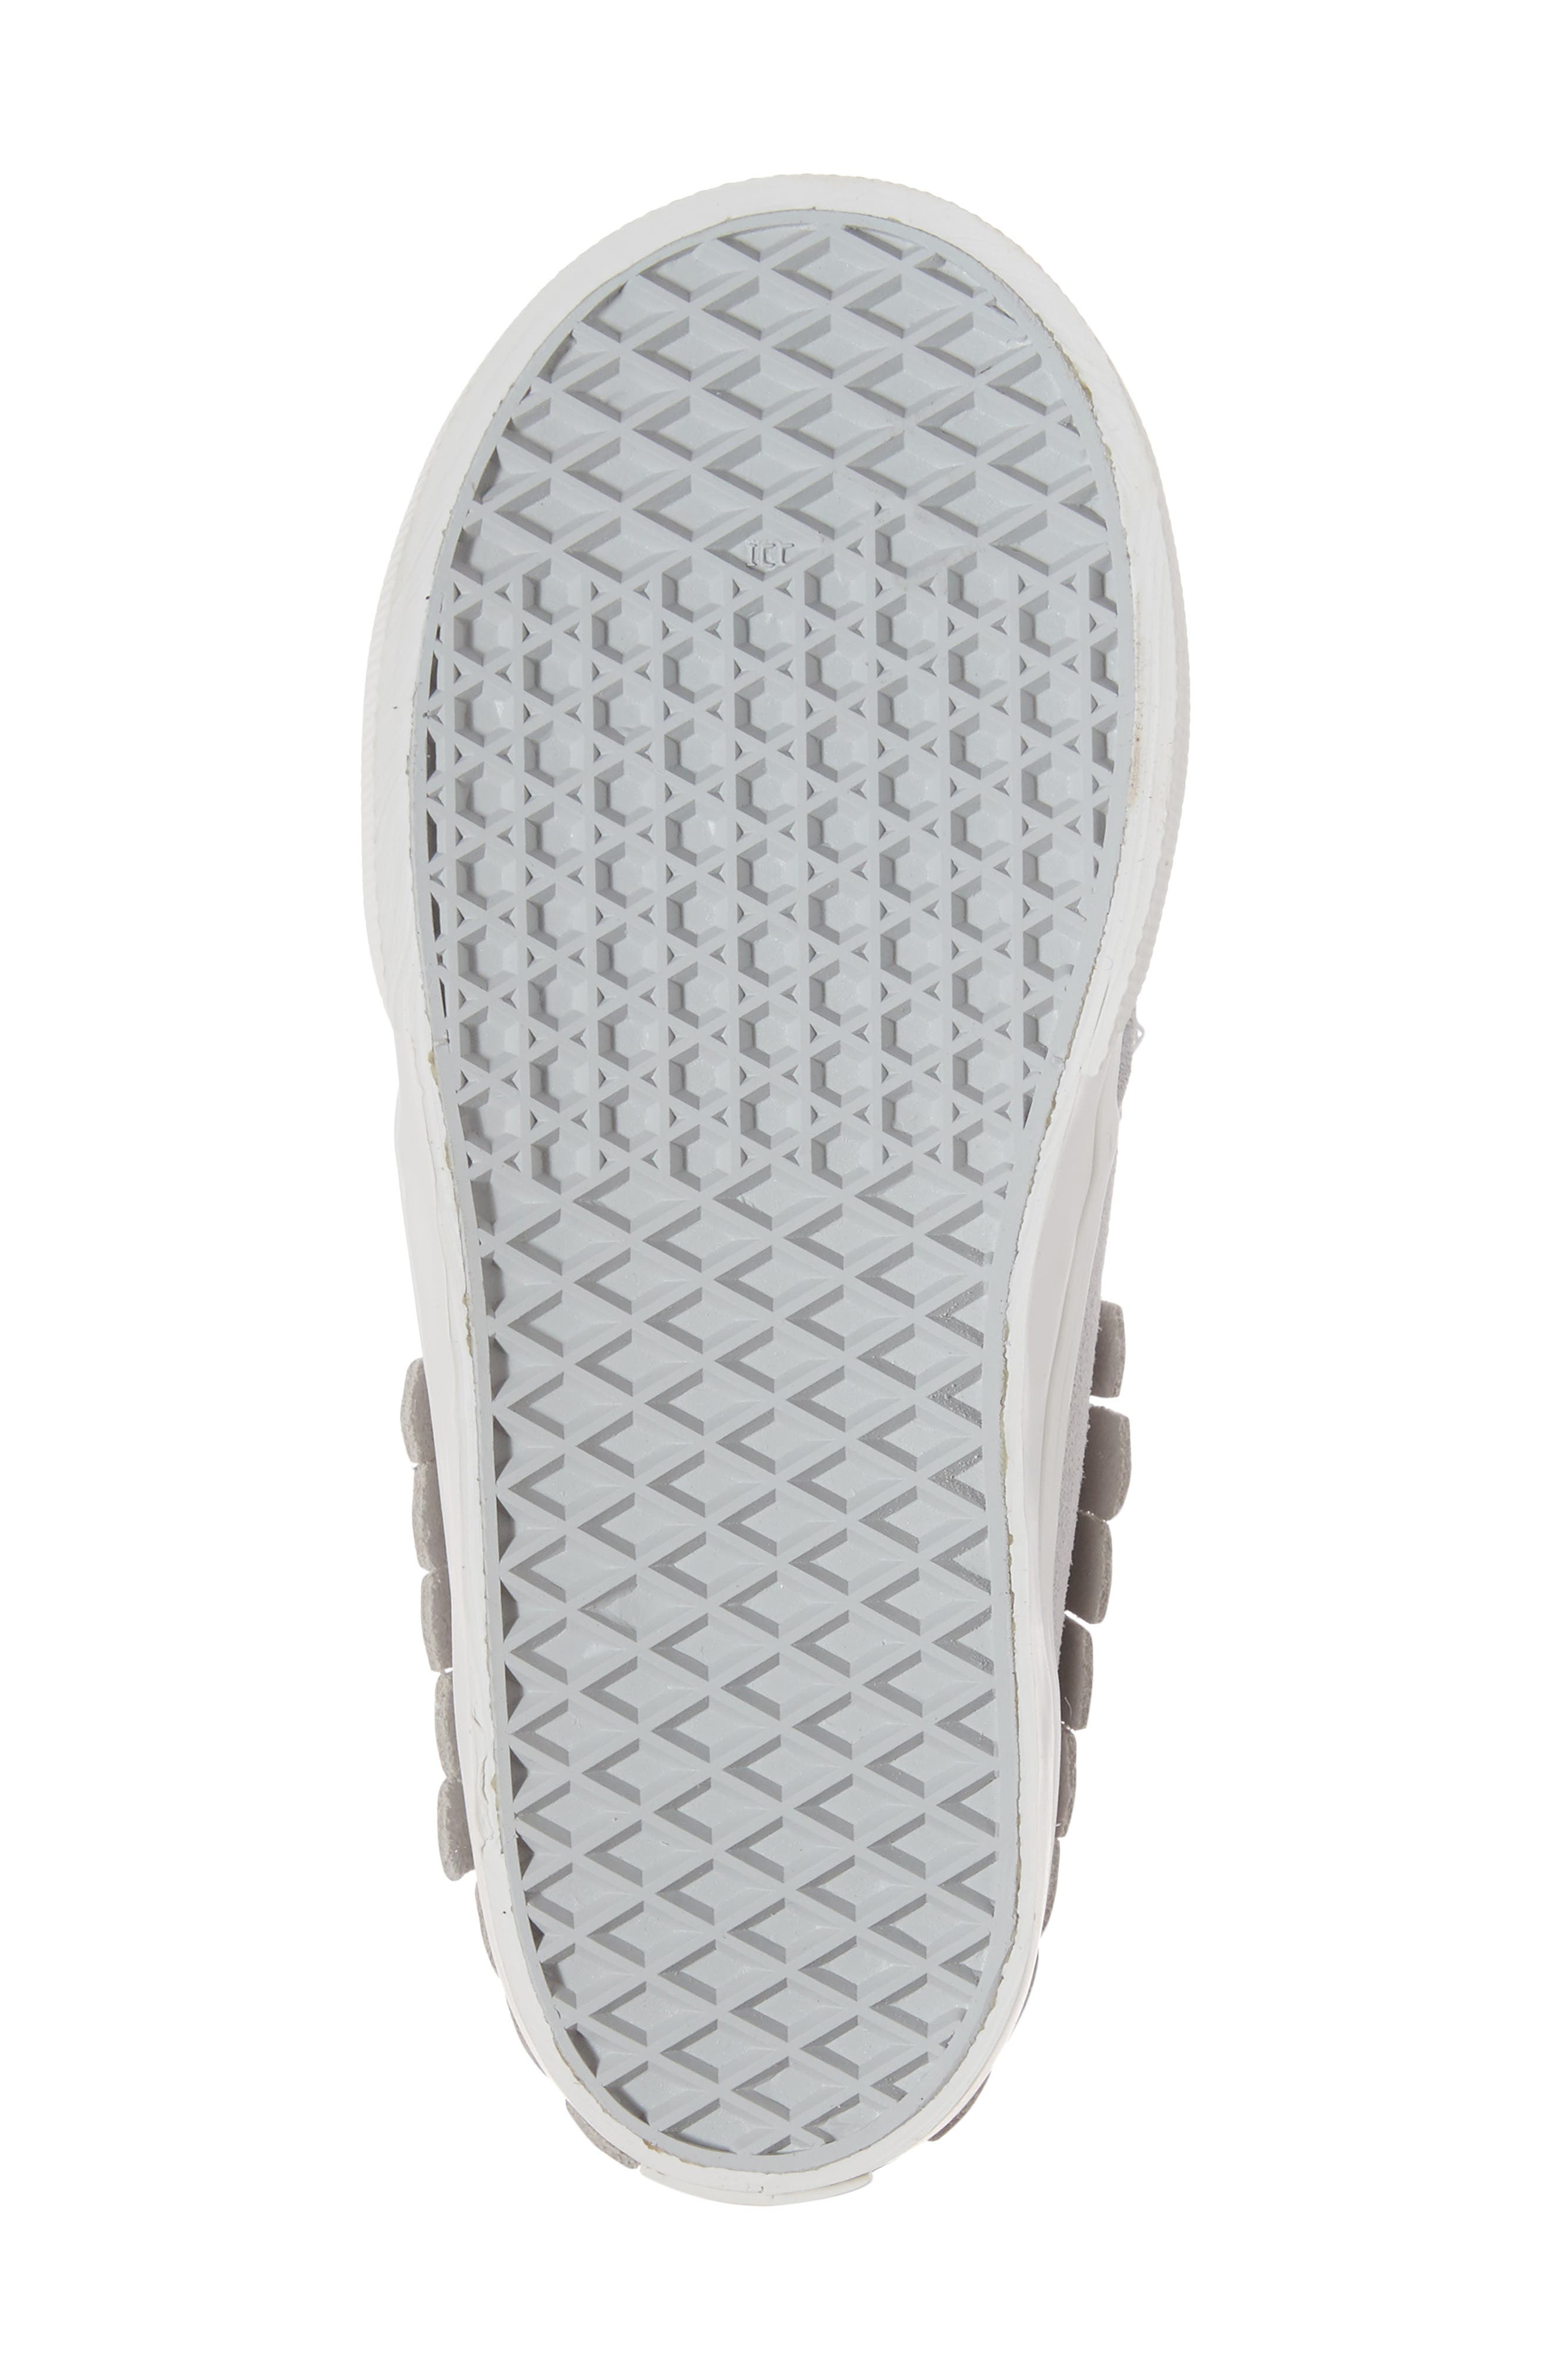 Chukka V Moc Sneaker,                             Alternate thumbnail 6, color,                             040